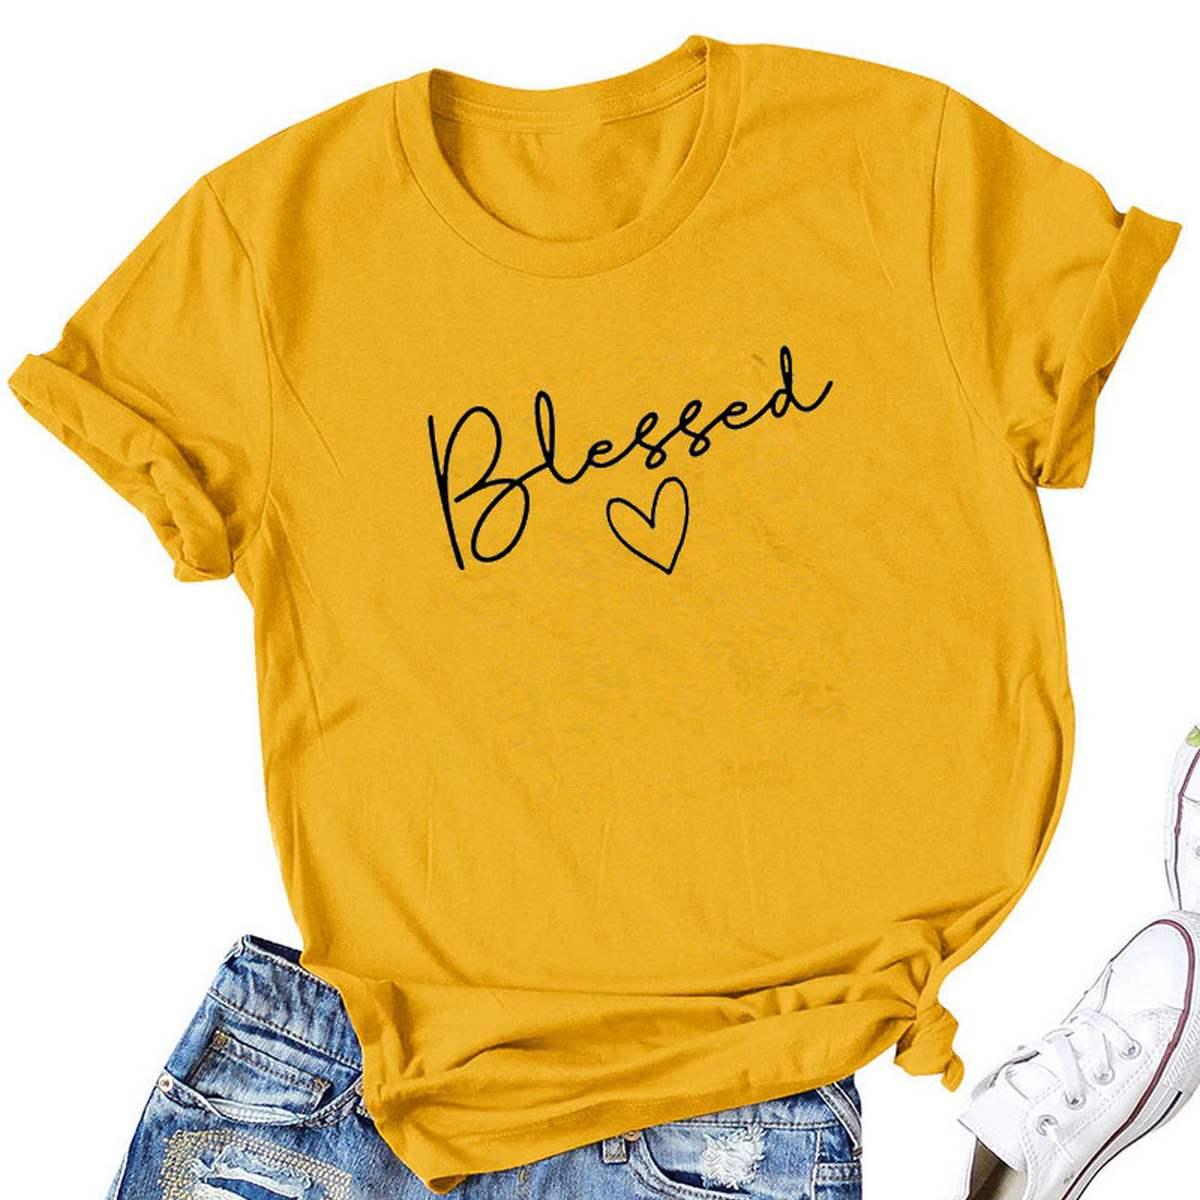 Summer Printed T shirt Half sleeve for girls & Women